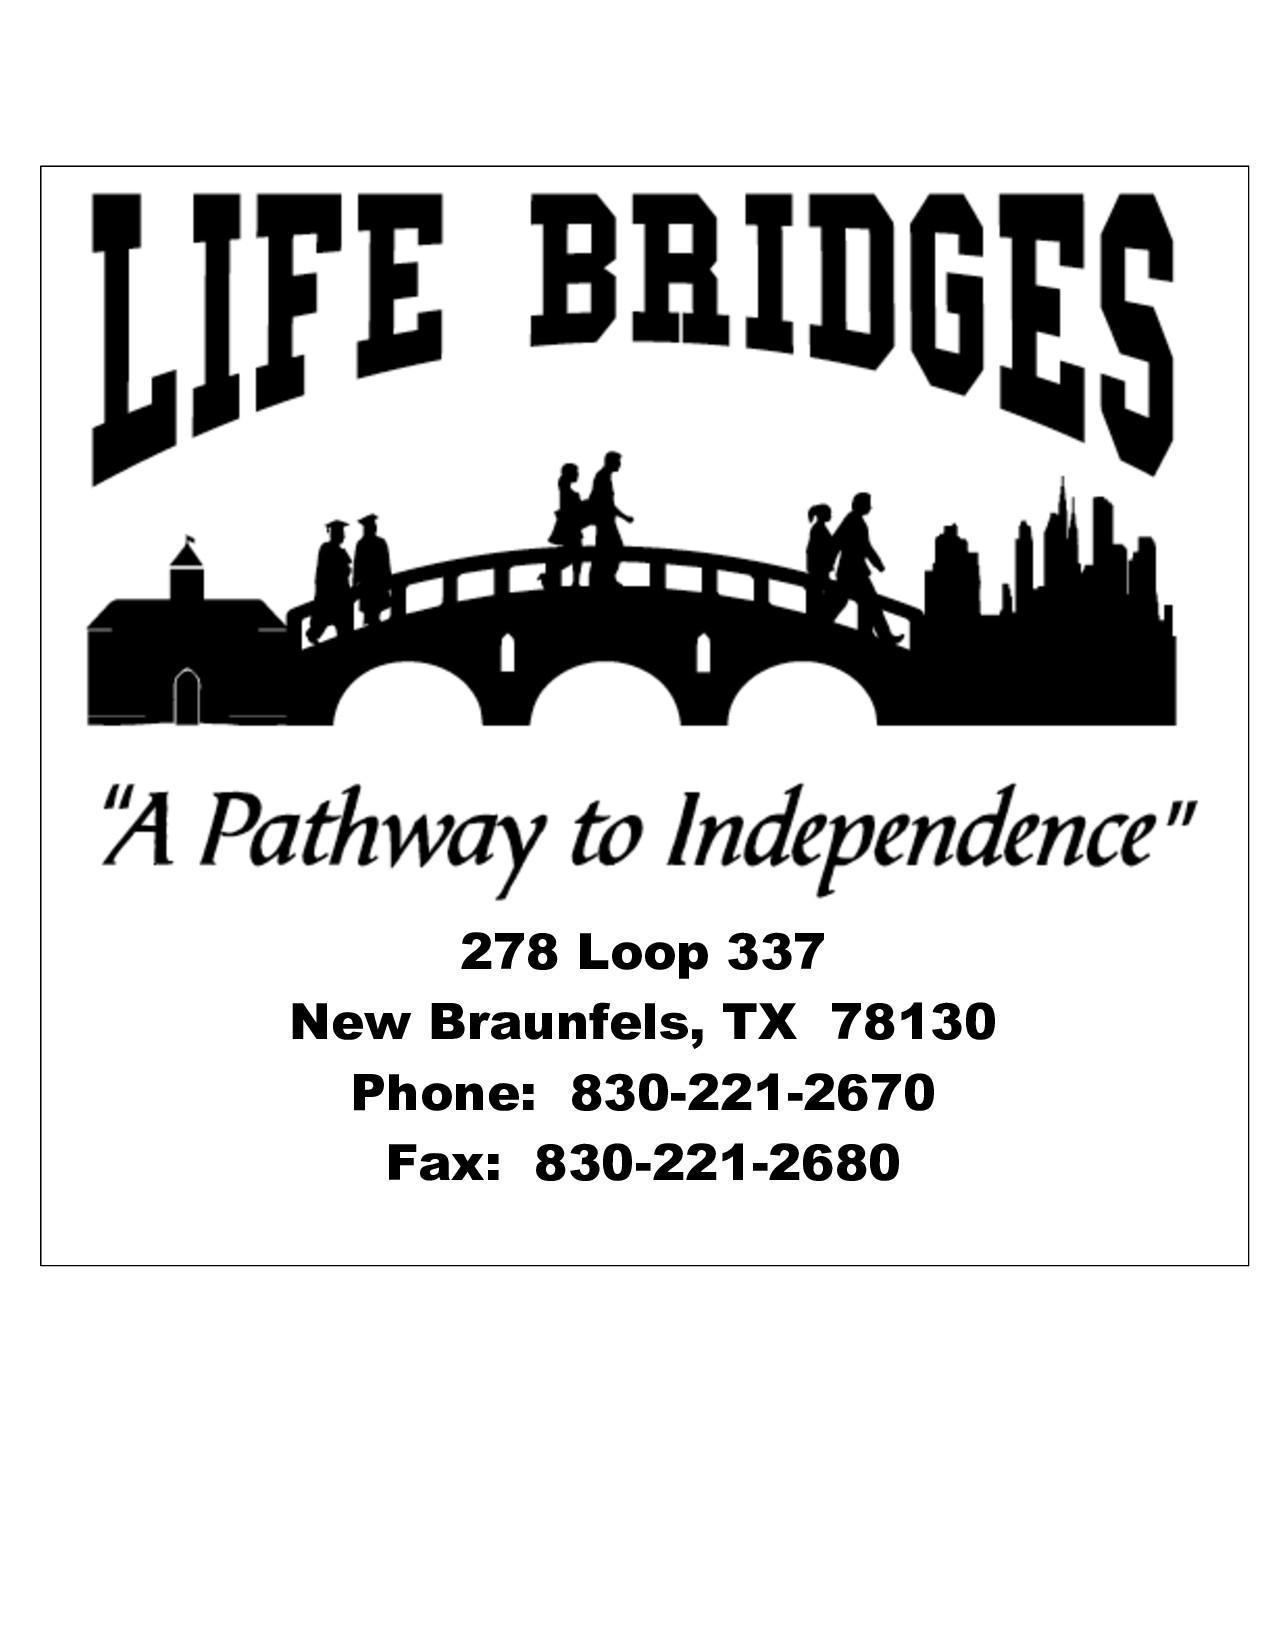 LB Logo with address